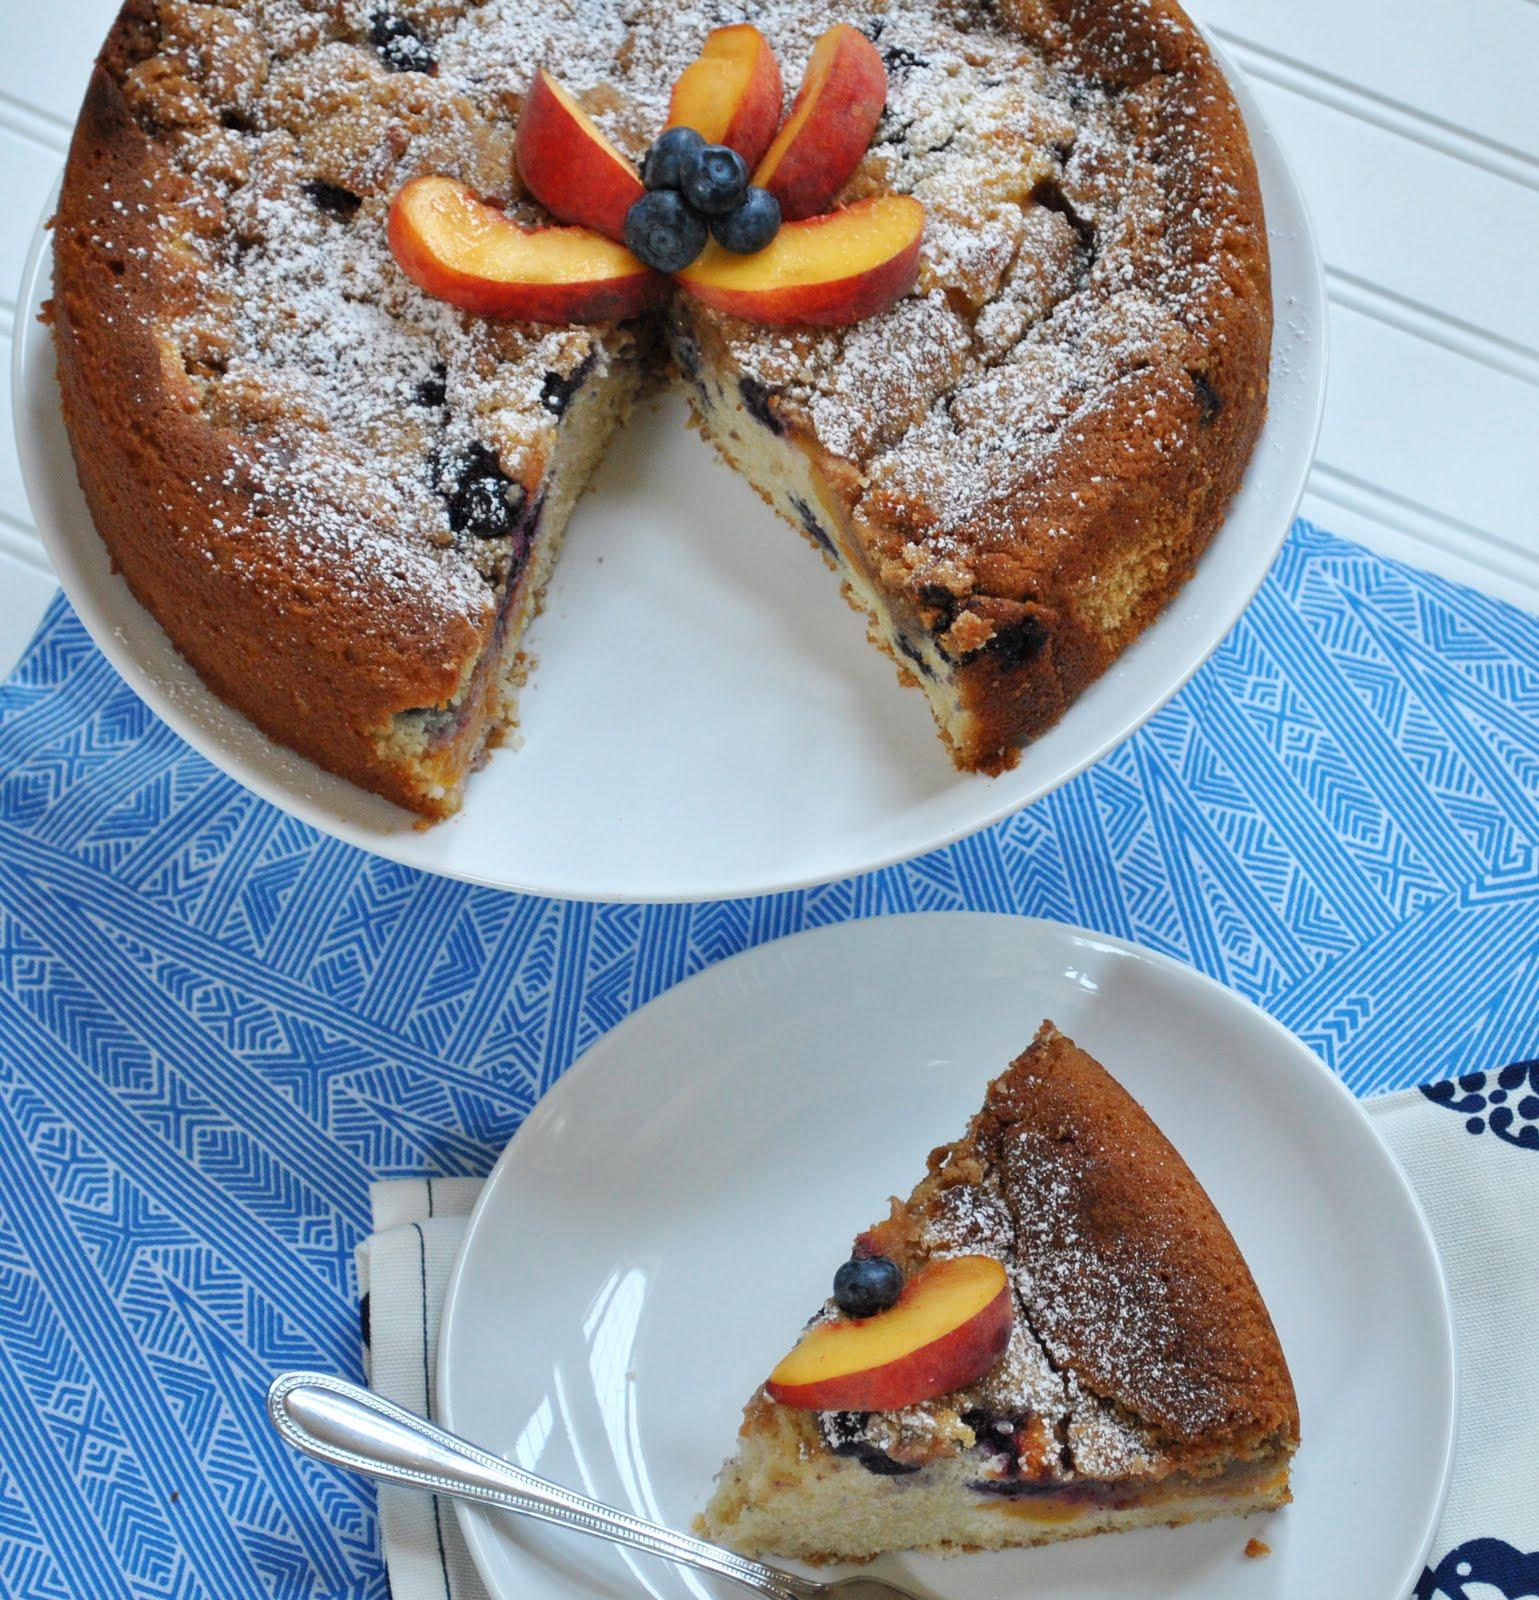 Ryan Bakes: Peach Week: Peach Blueberry Coffee Cake